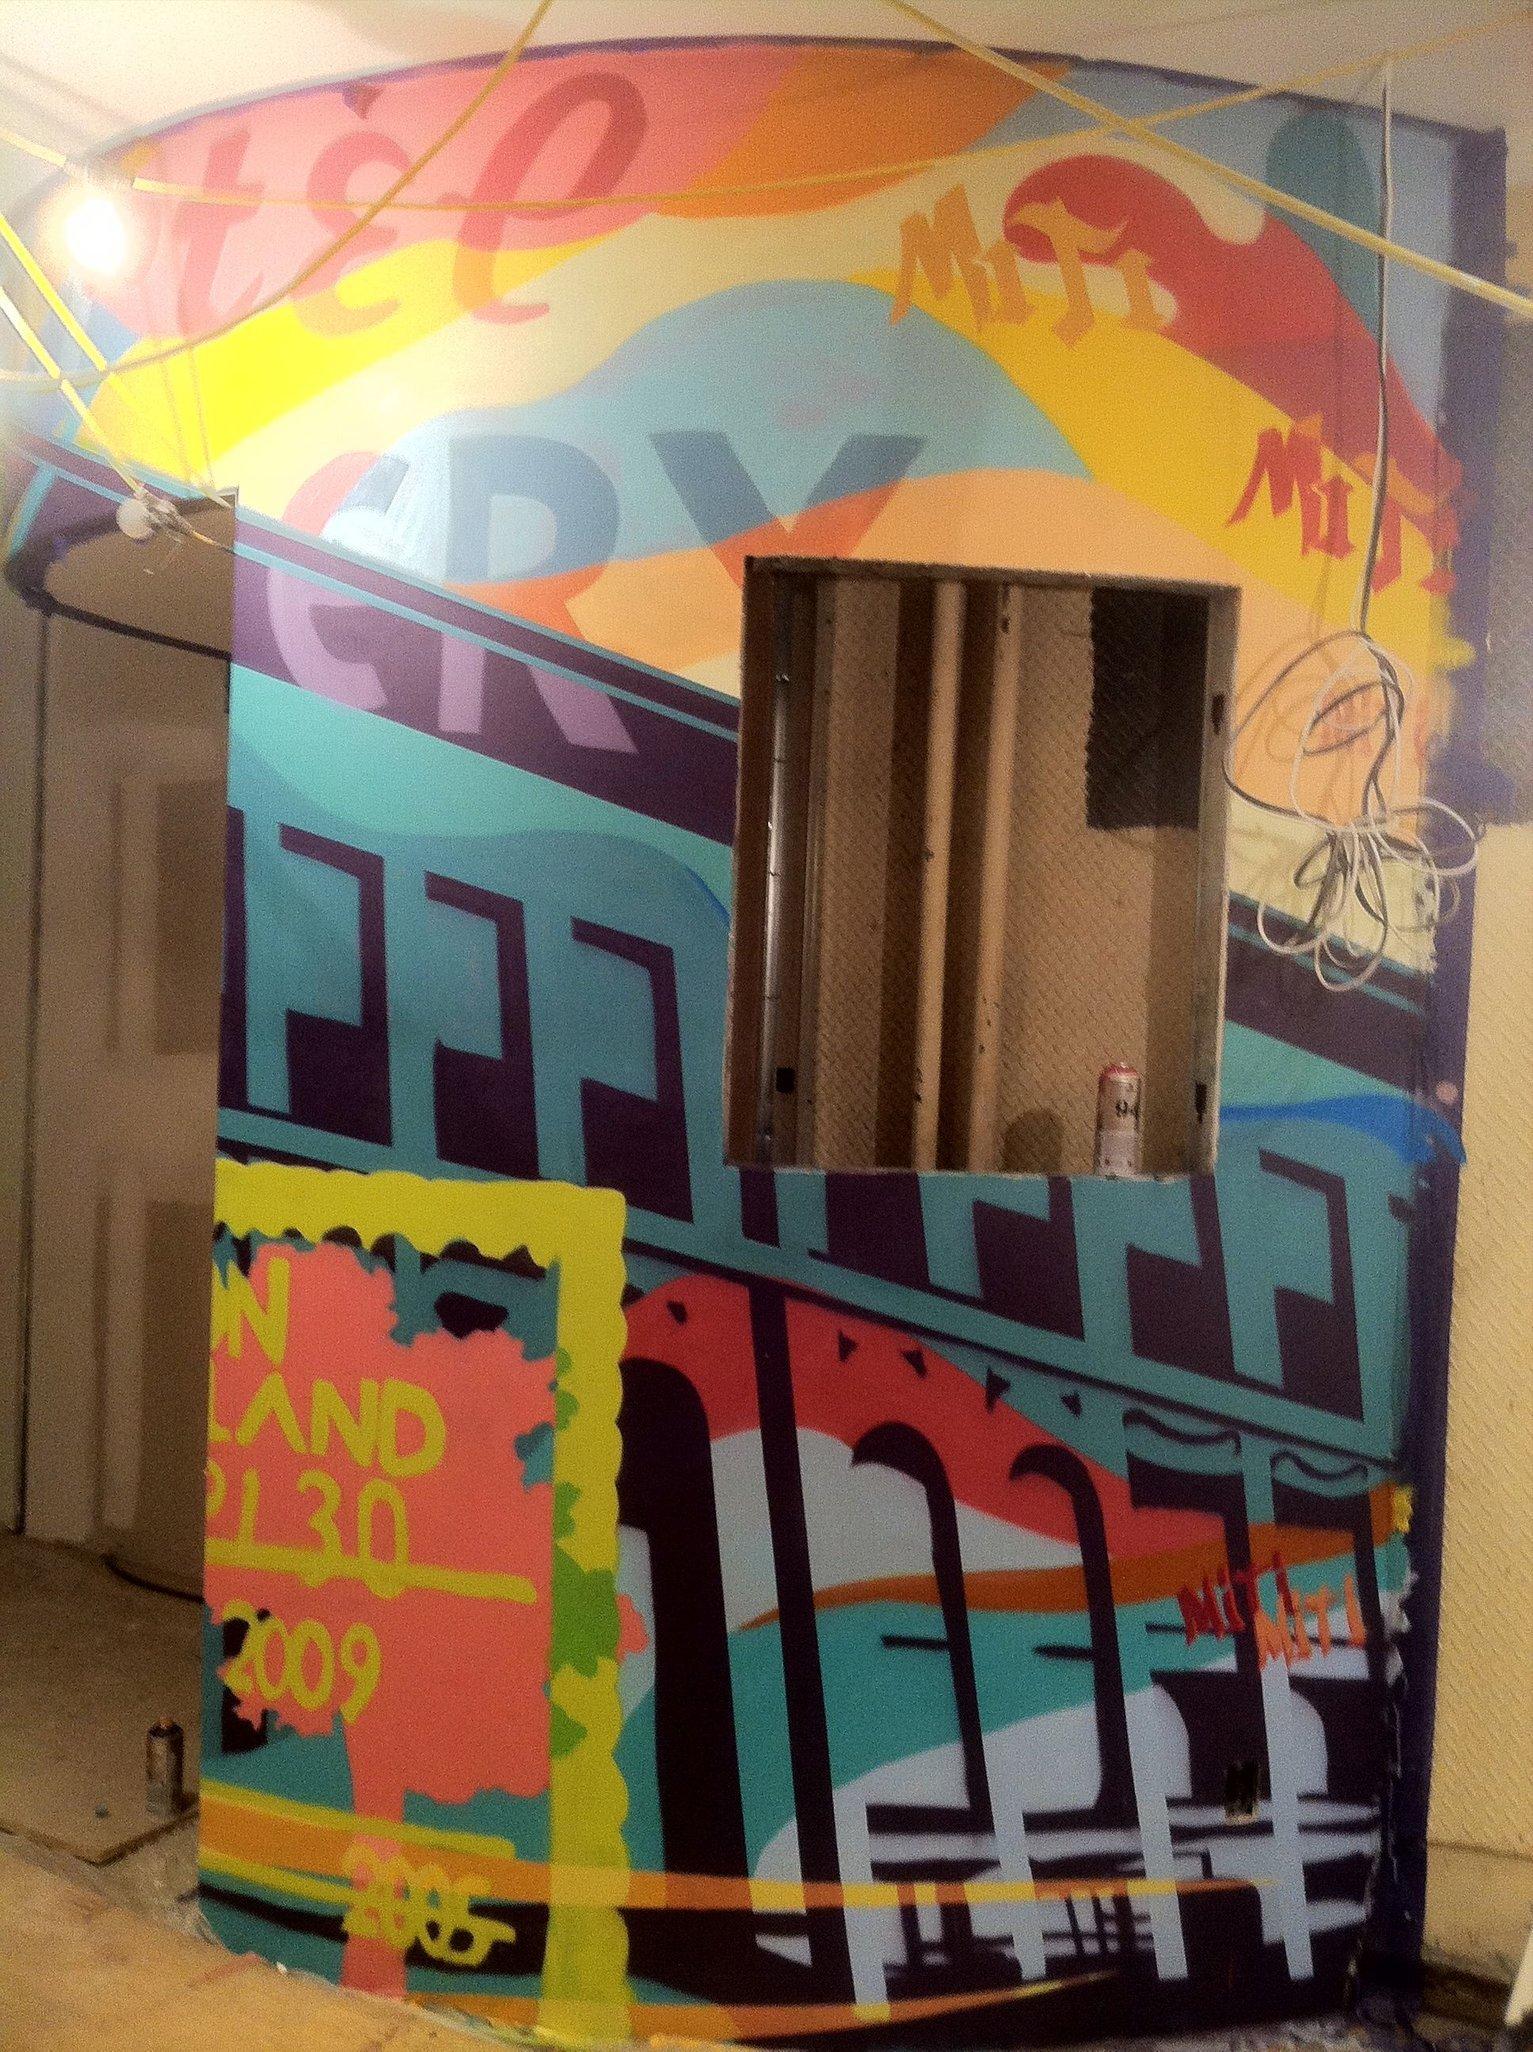 Section of Miti Miti restaurant mural